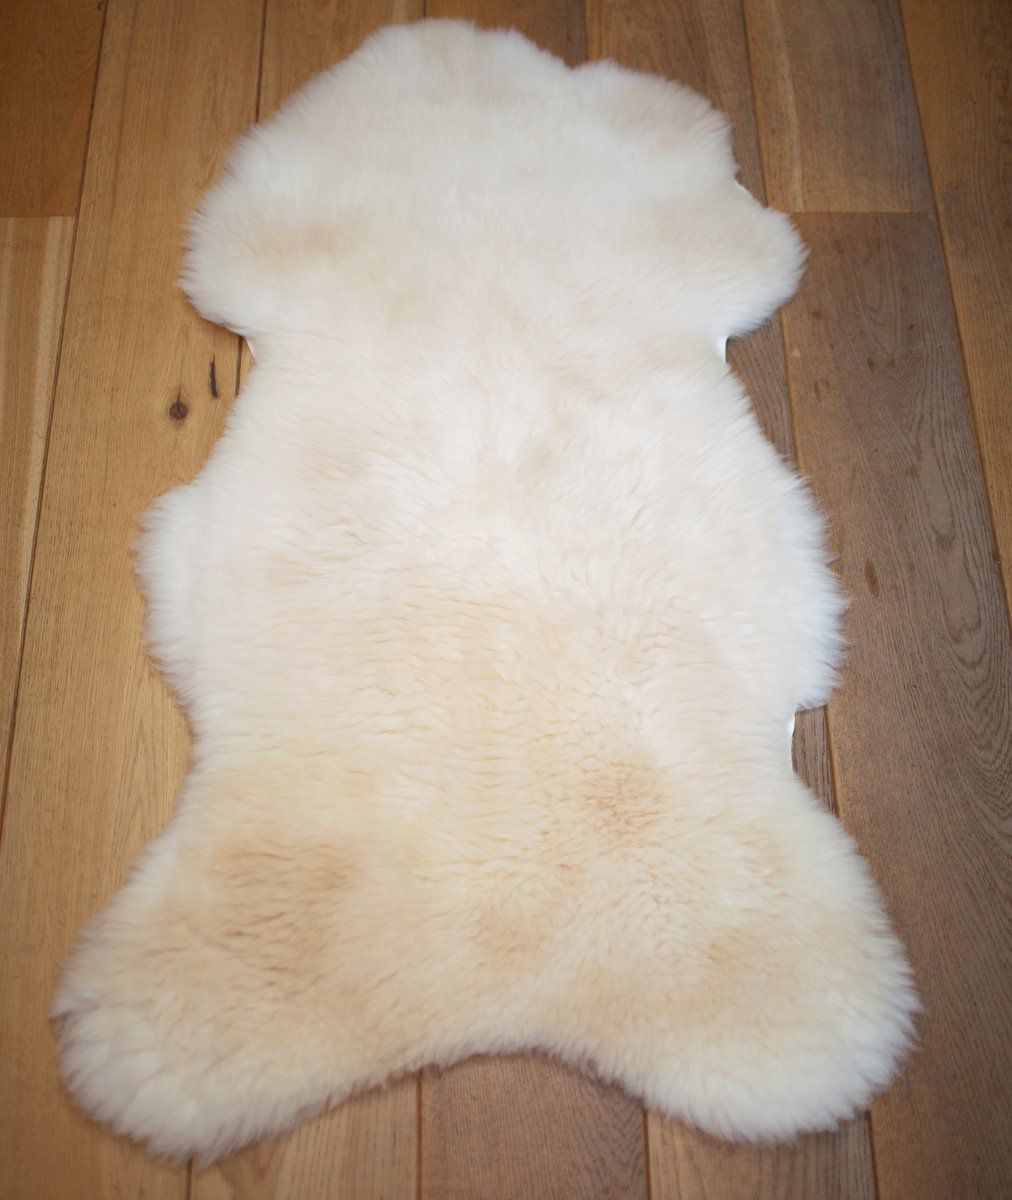 Off-white UK sheepskin rug L